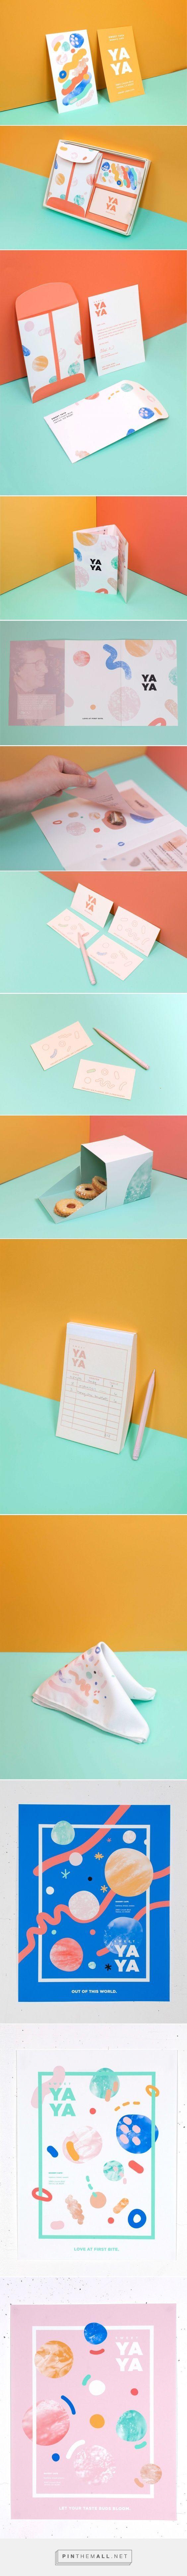 Sweet Yaya Bakery Branding by Sara Haas   Fivestar Branding Agency – Design and Branding Agency & Curated Inspiration Gallery